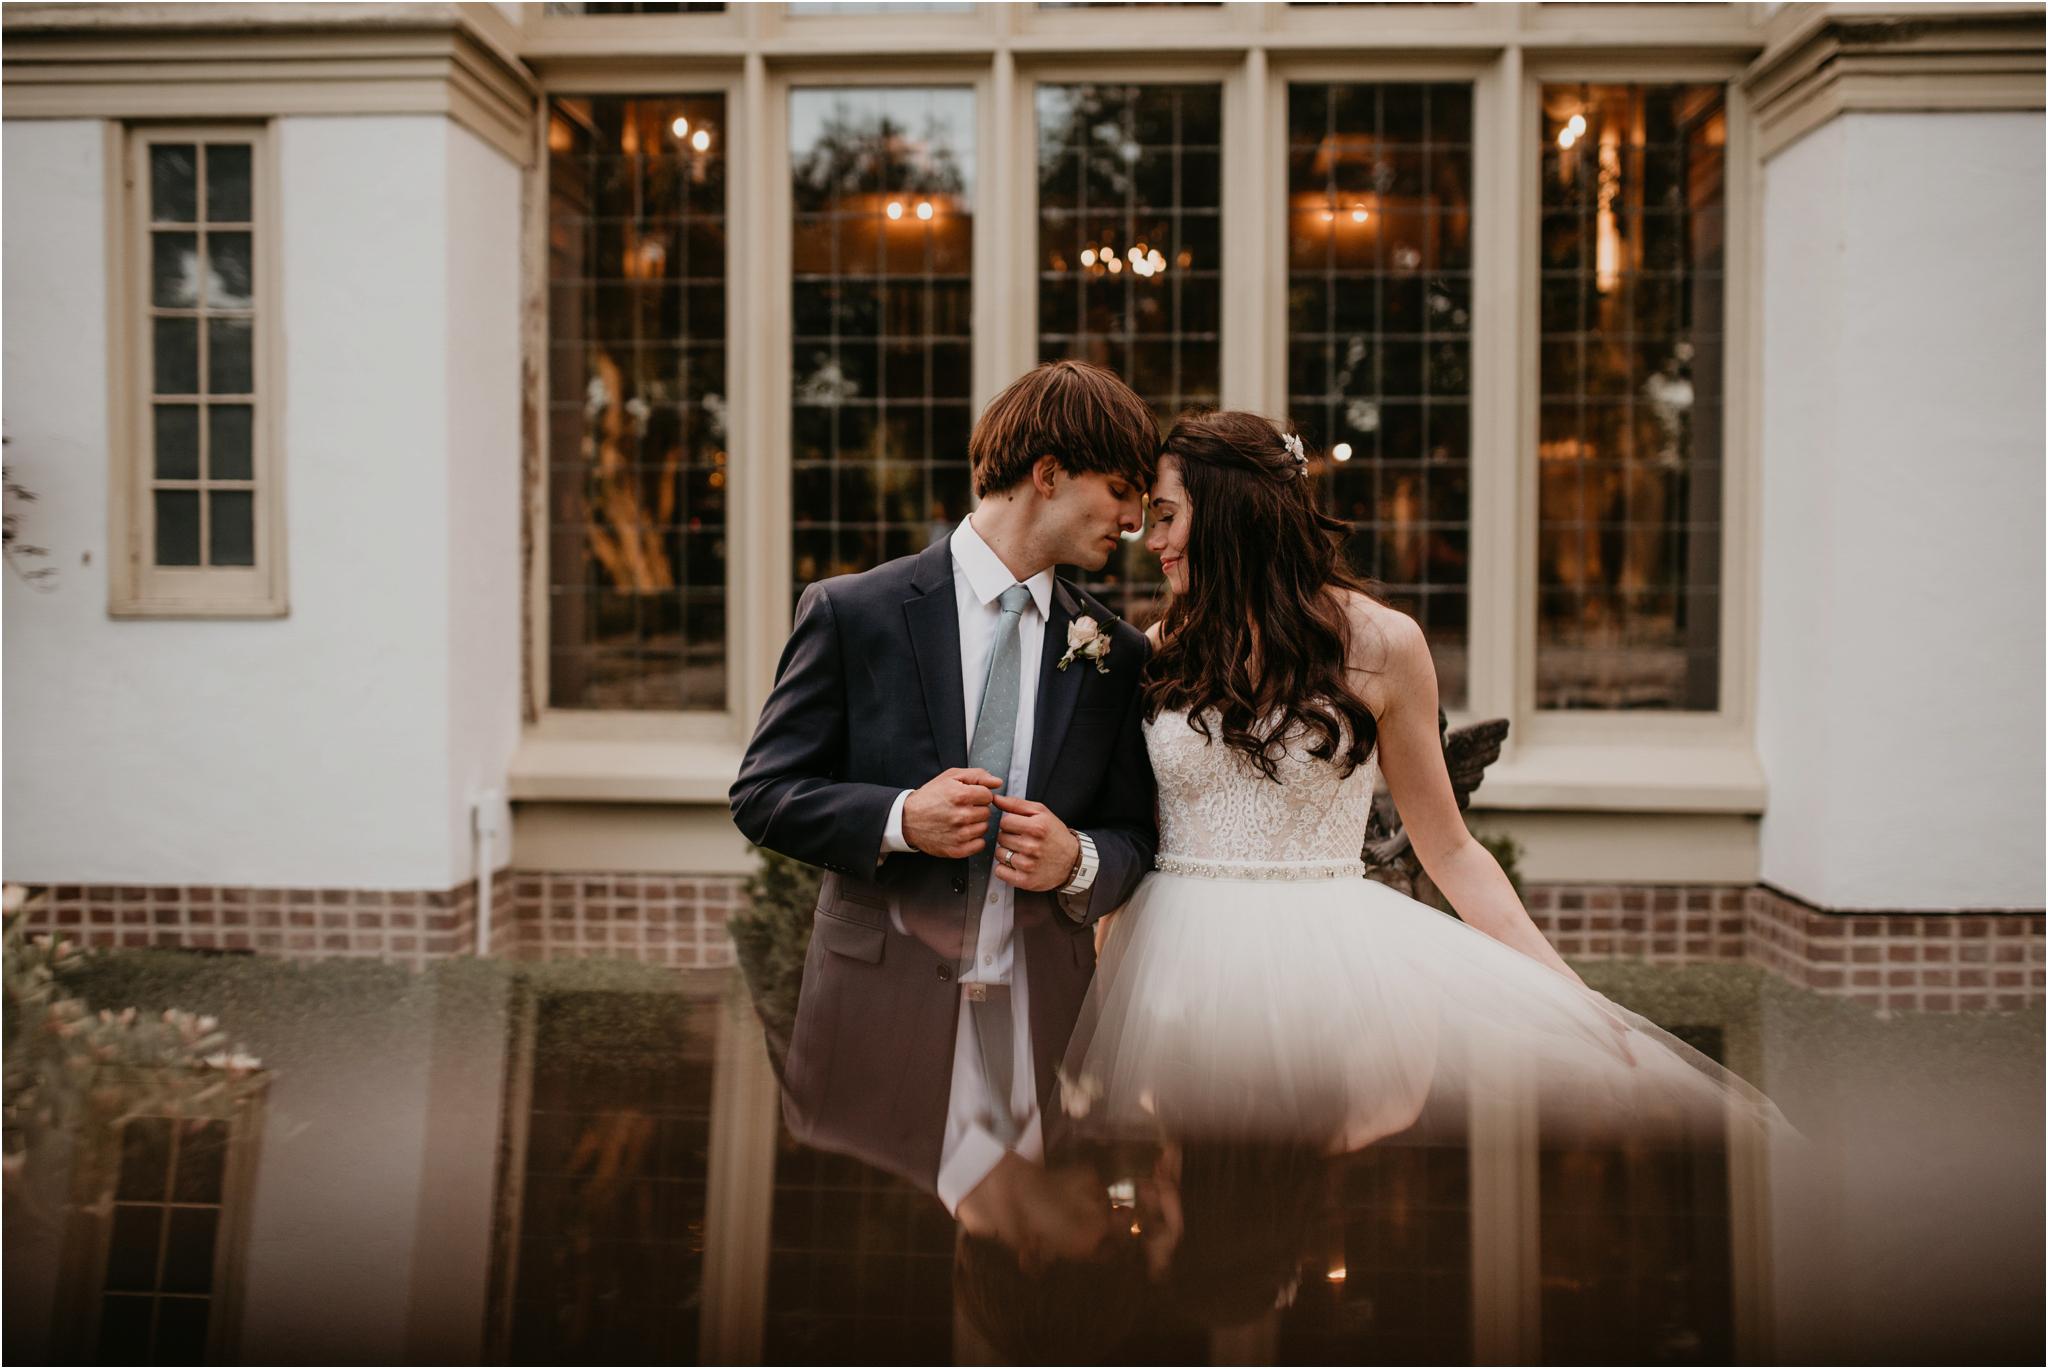 chance-and-ondrea-lairmont-manor-wedding-seattle-photographer-122.jpg